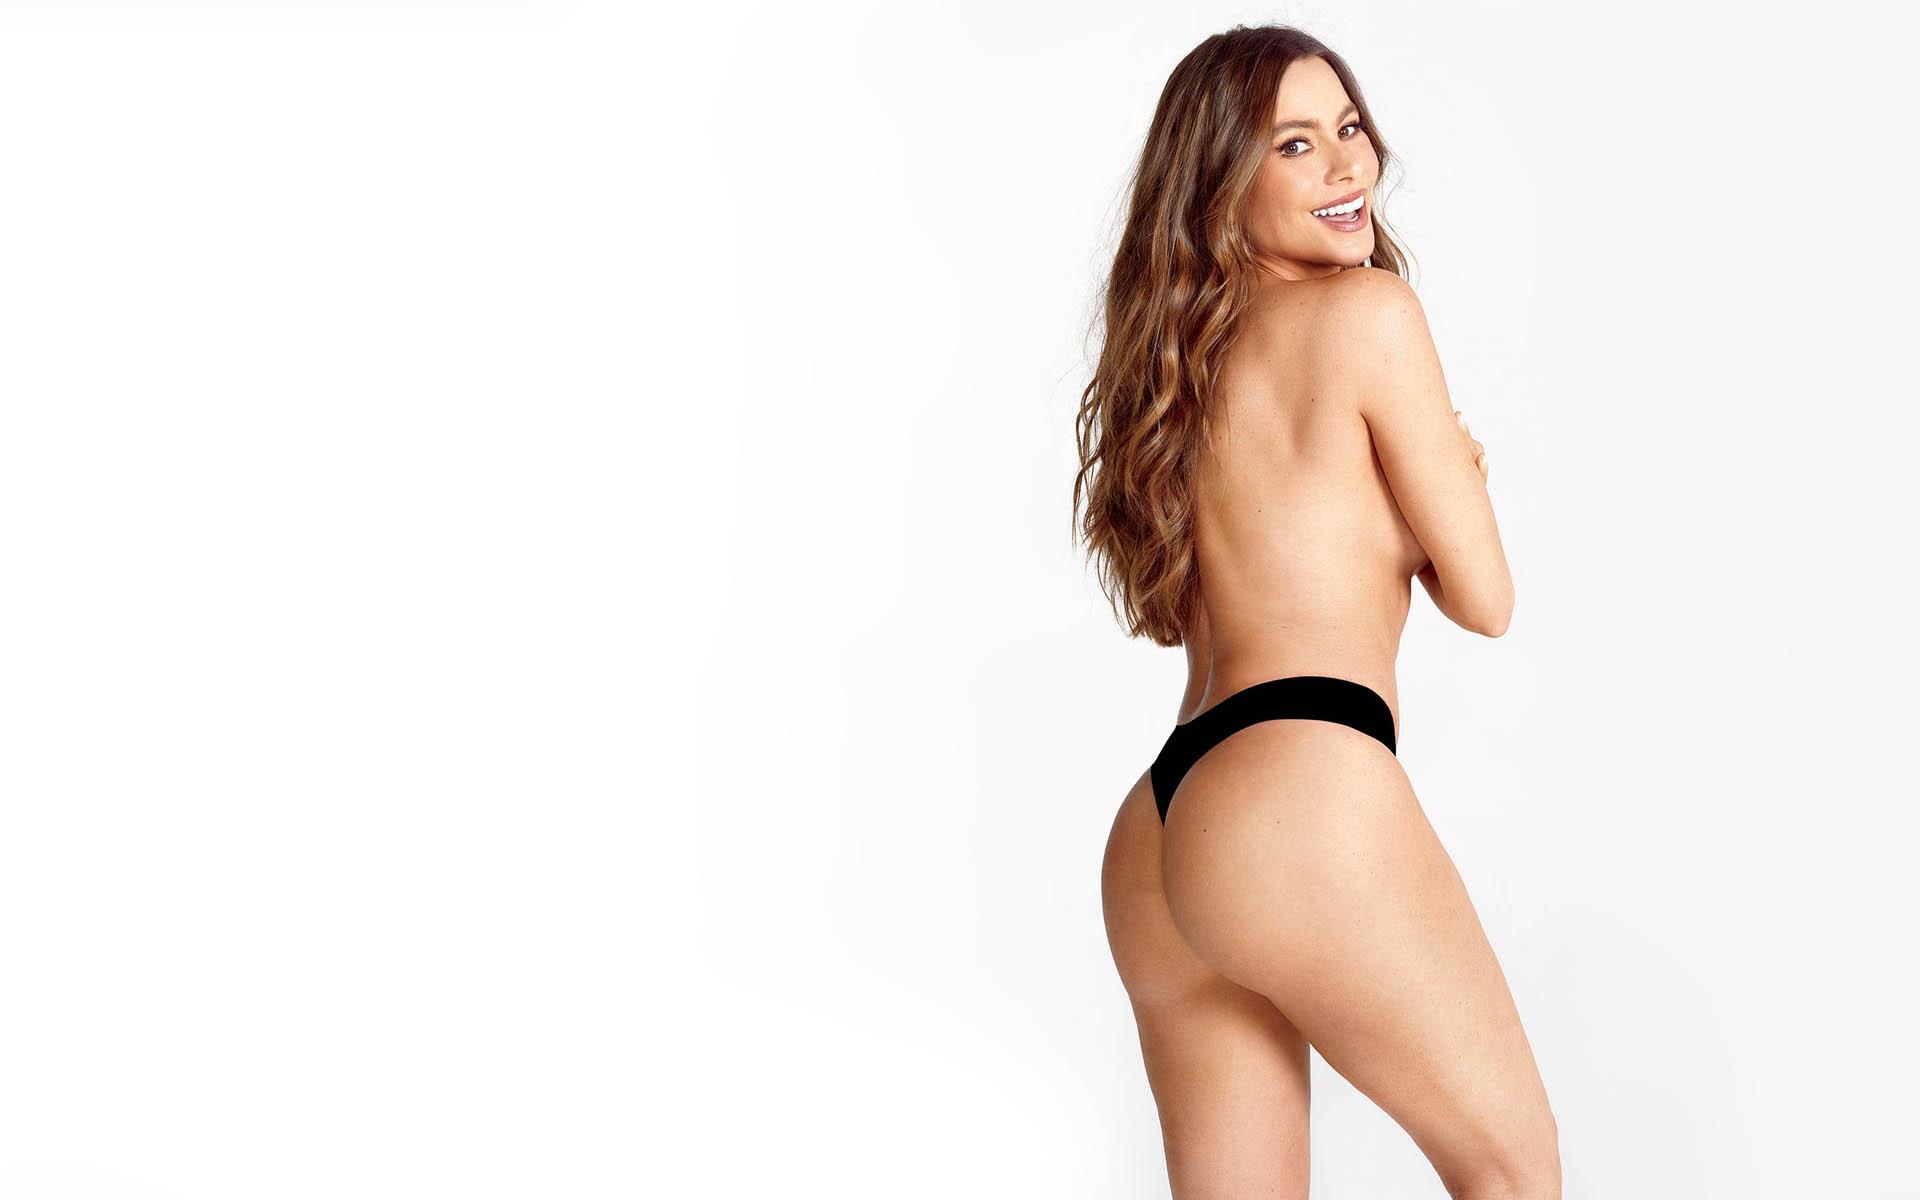 Eric stonestreet is still tweeting pics of sofia vergara's butt